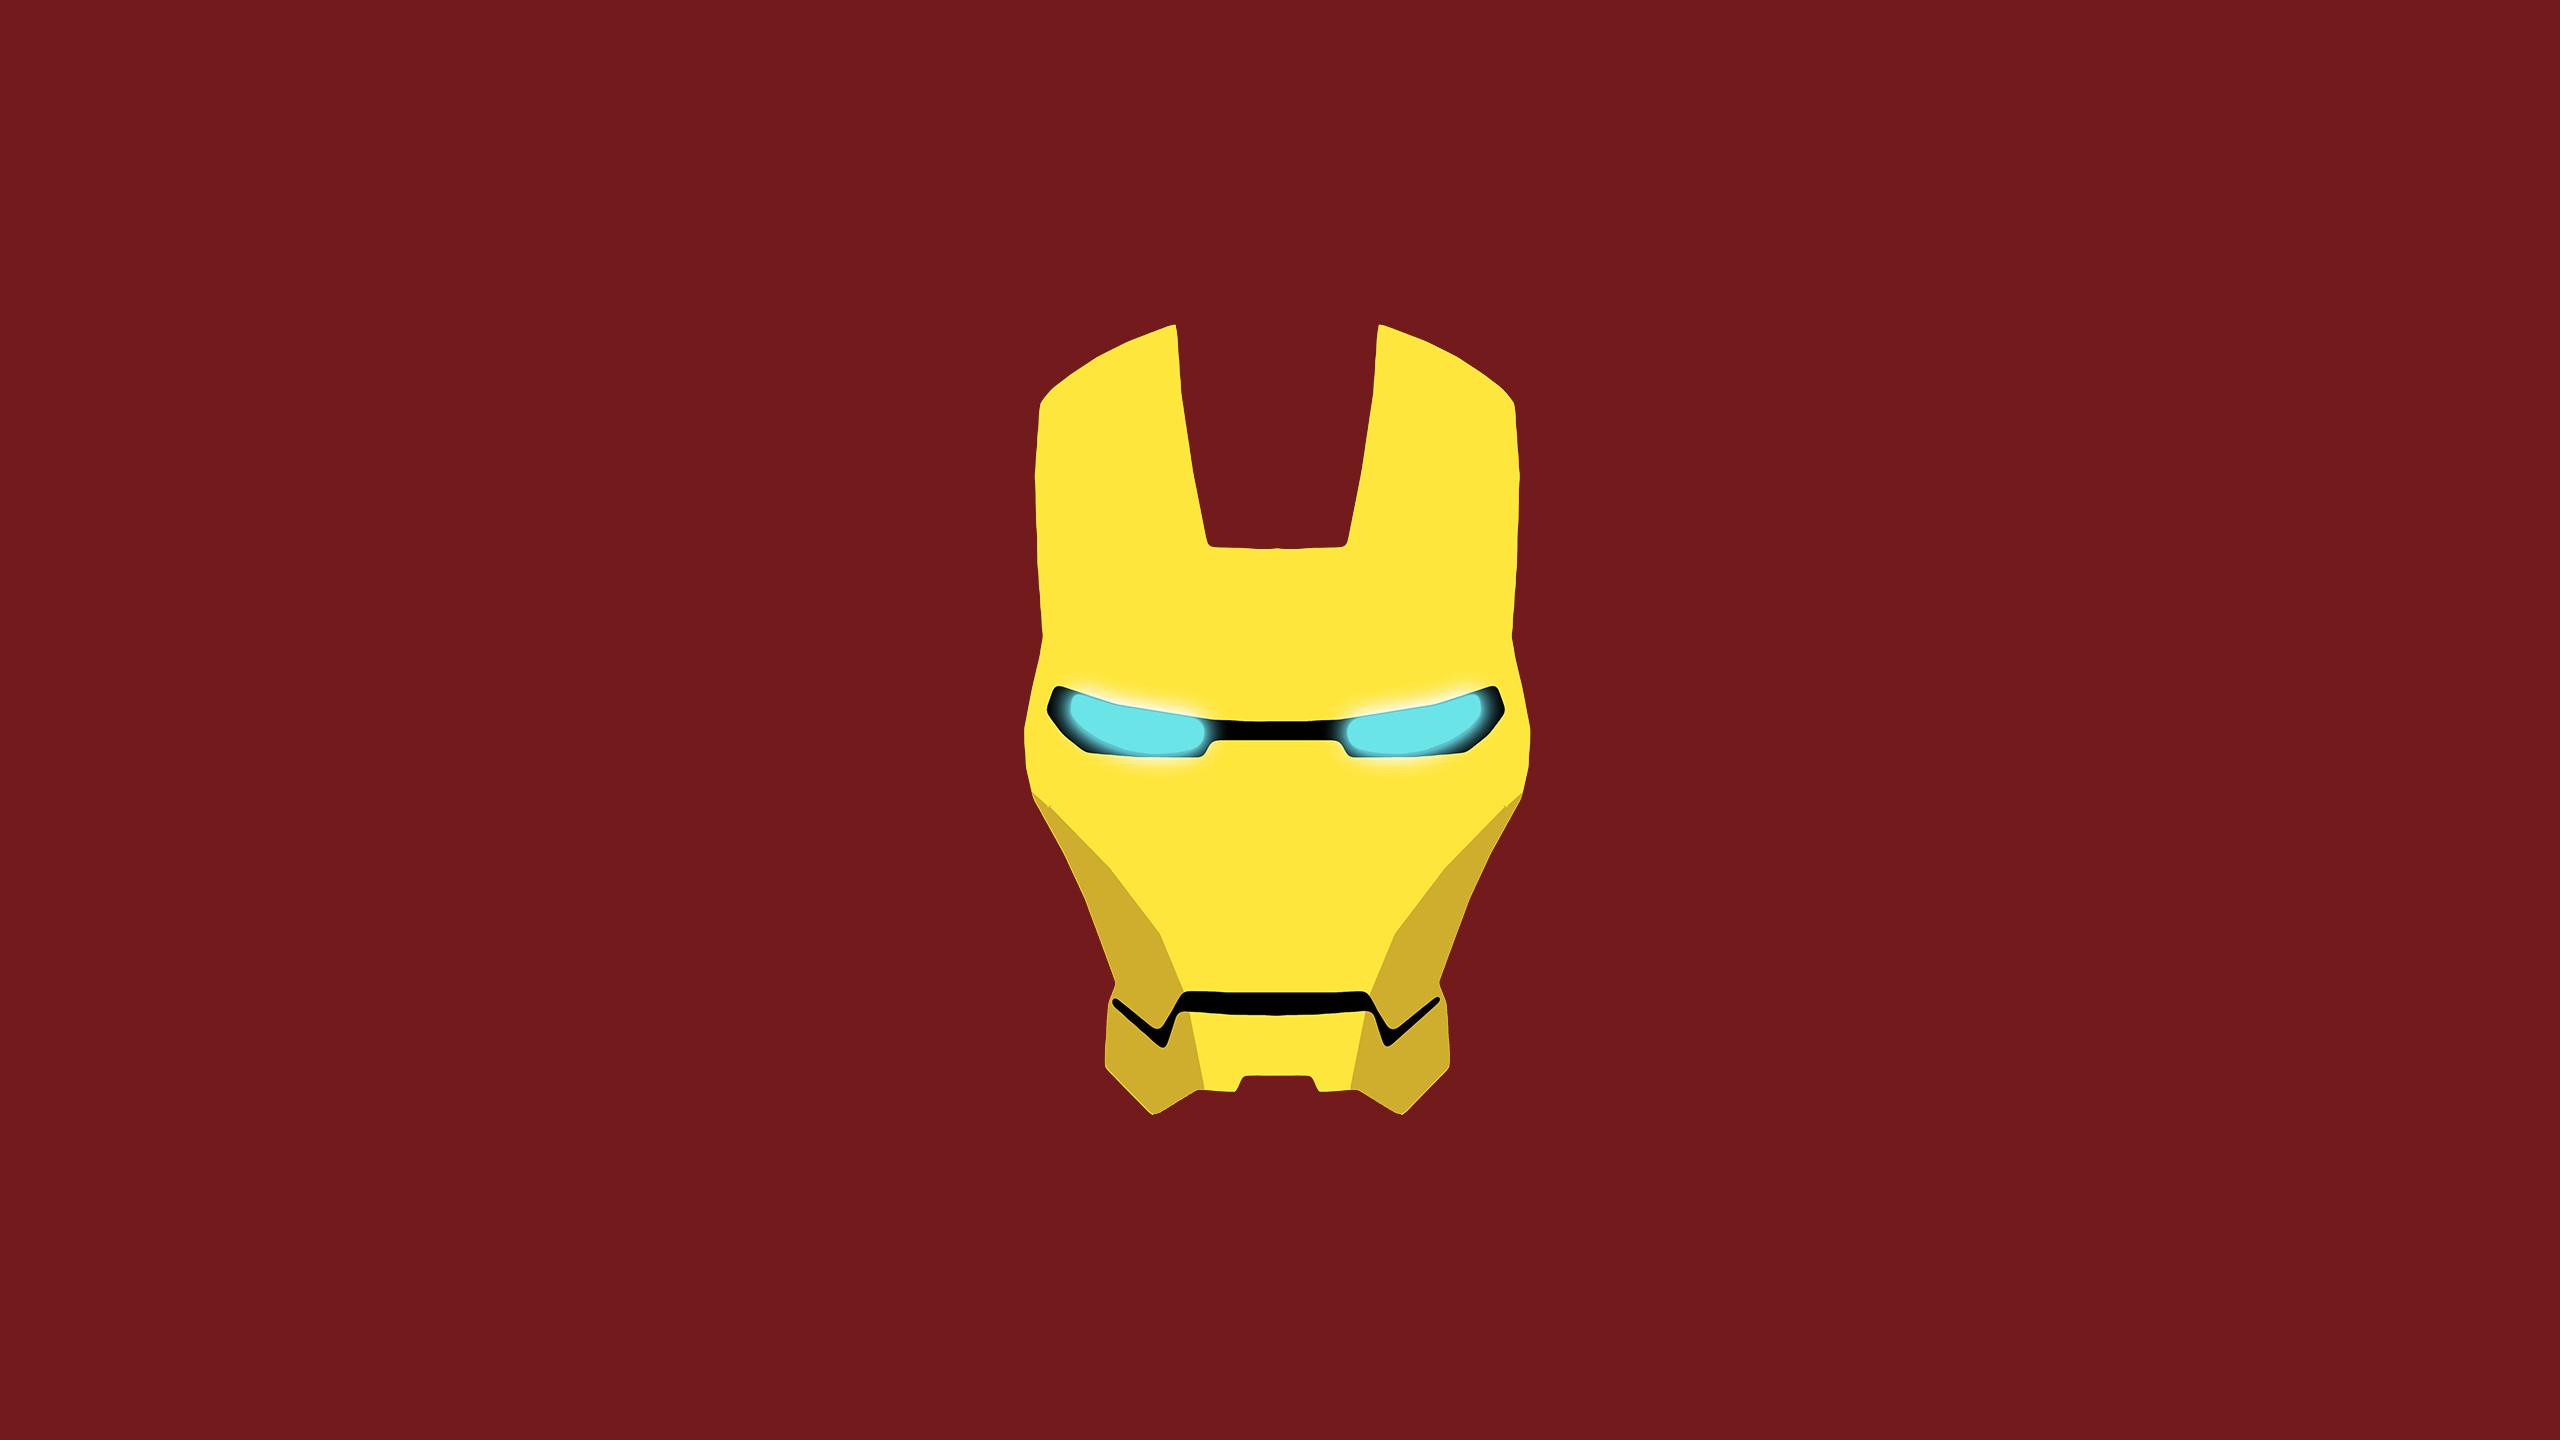 1080x1920 Daredevil Minimalism Iphone 7 6s 6 Plus Pixel: 1080x1920 Iron Mask Artwork Iphone 7,6s,6 Plus, Pixel Xl